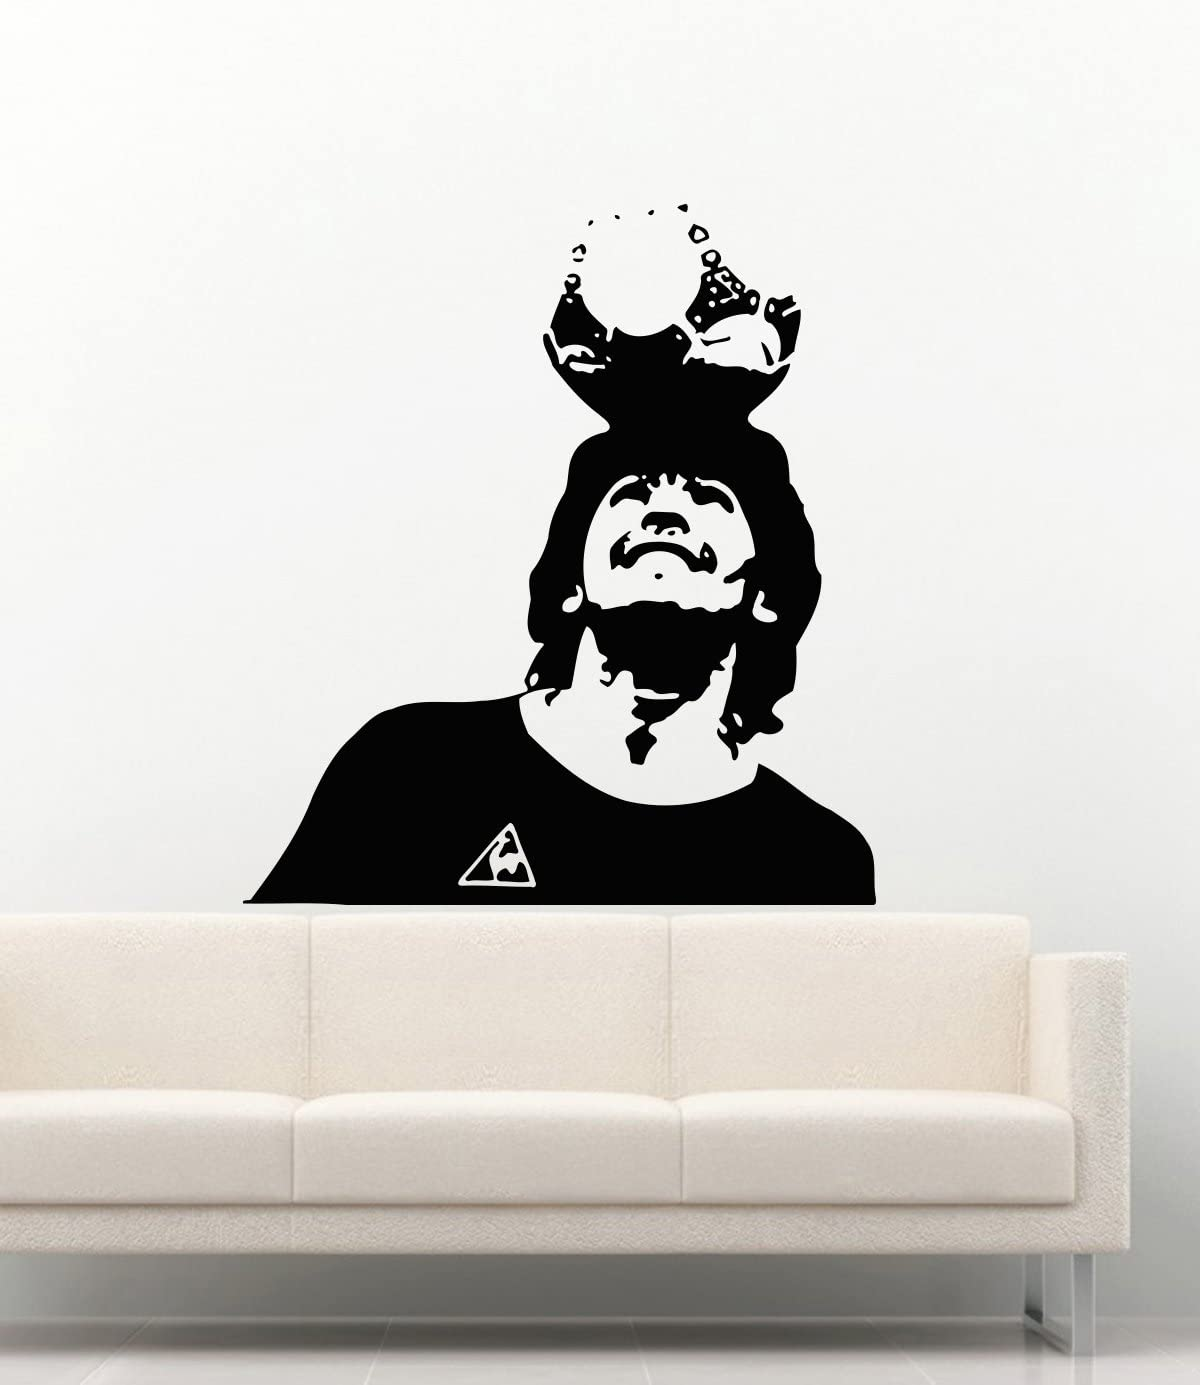 football Diego Armando Maradona wall sticker home decor soccer sports in room